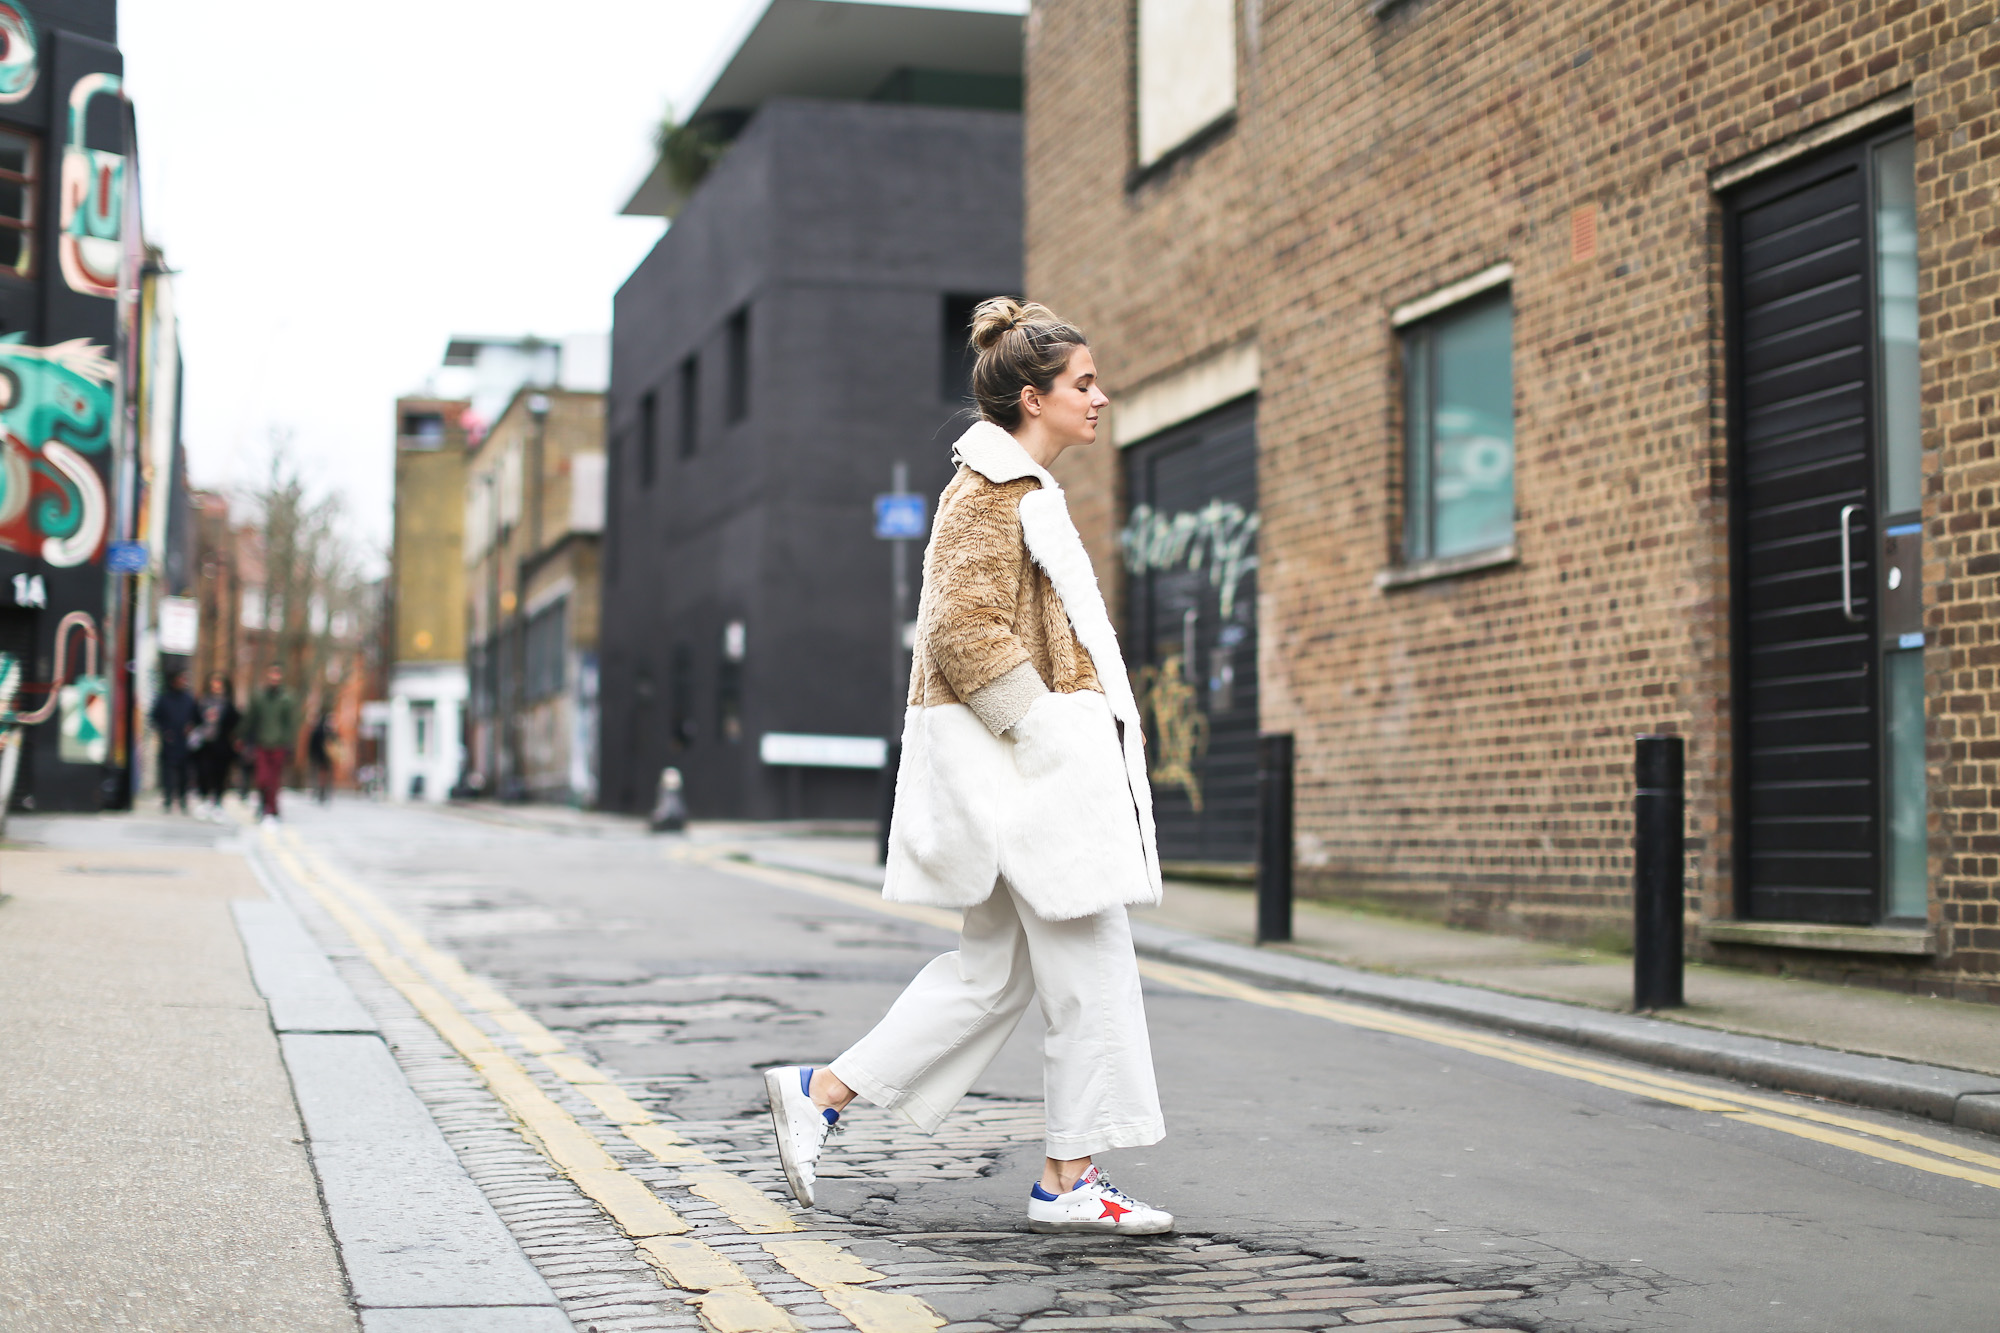 Clochet_streetstyle_asos_patchwork_faux_fur_coat_goldengoose_superstar_sneakers_topshopunique_show-4